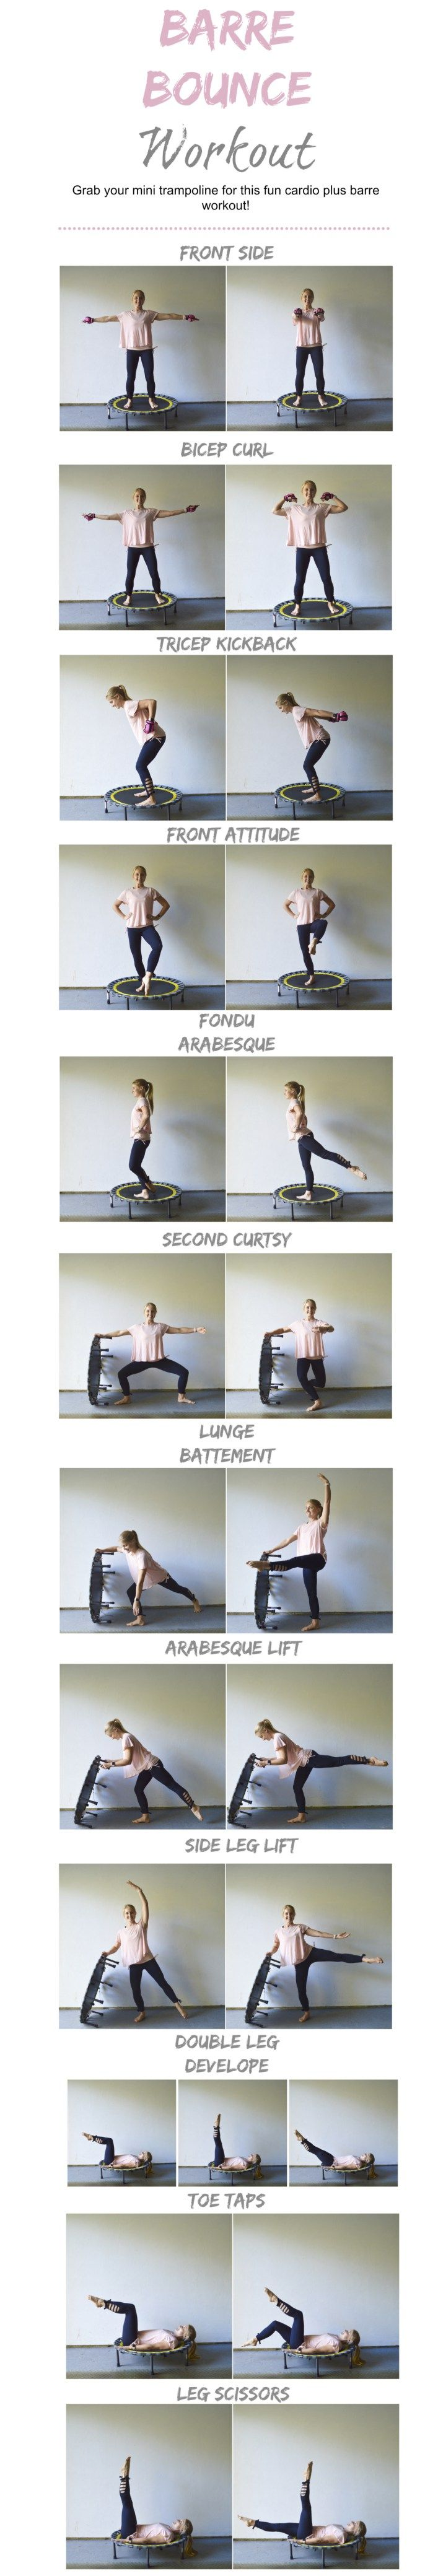 Barre Bounce Mini Trampoline Workout combining cardio and barre! #barre #barrebounce #minitrampoline #workout #barreworkout